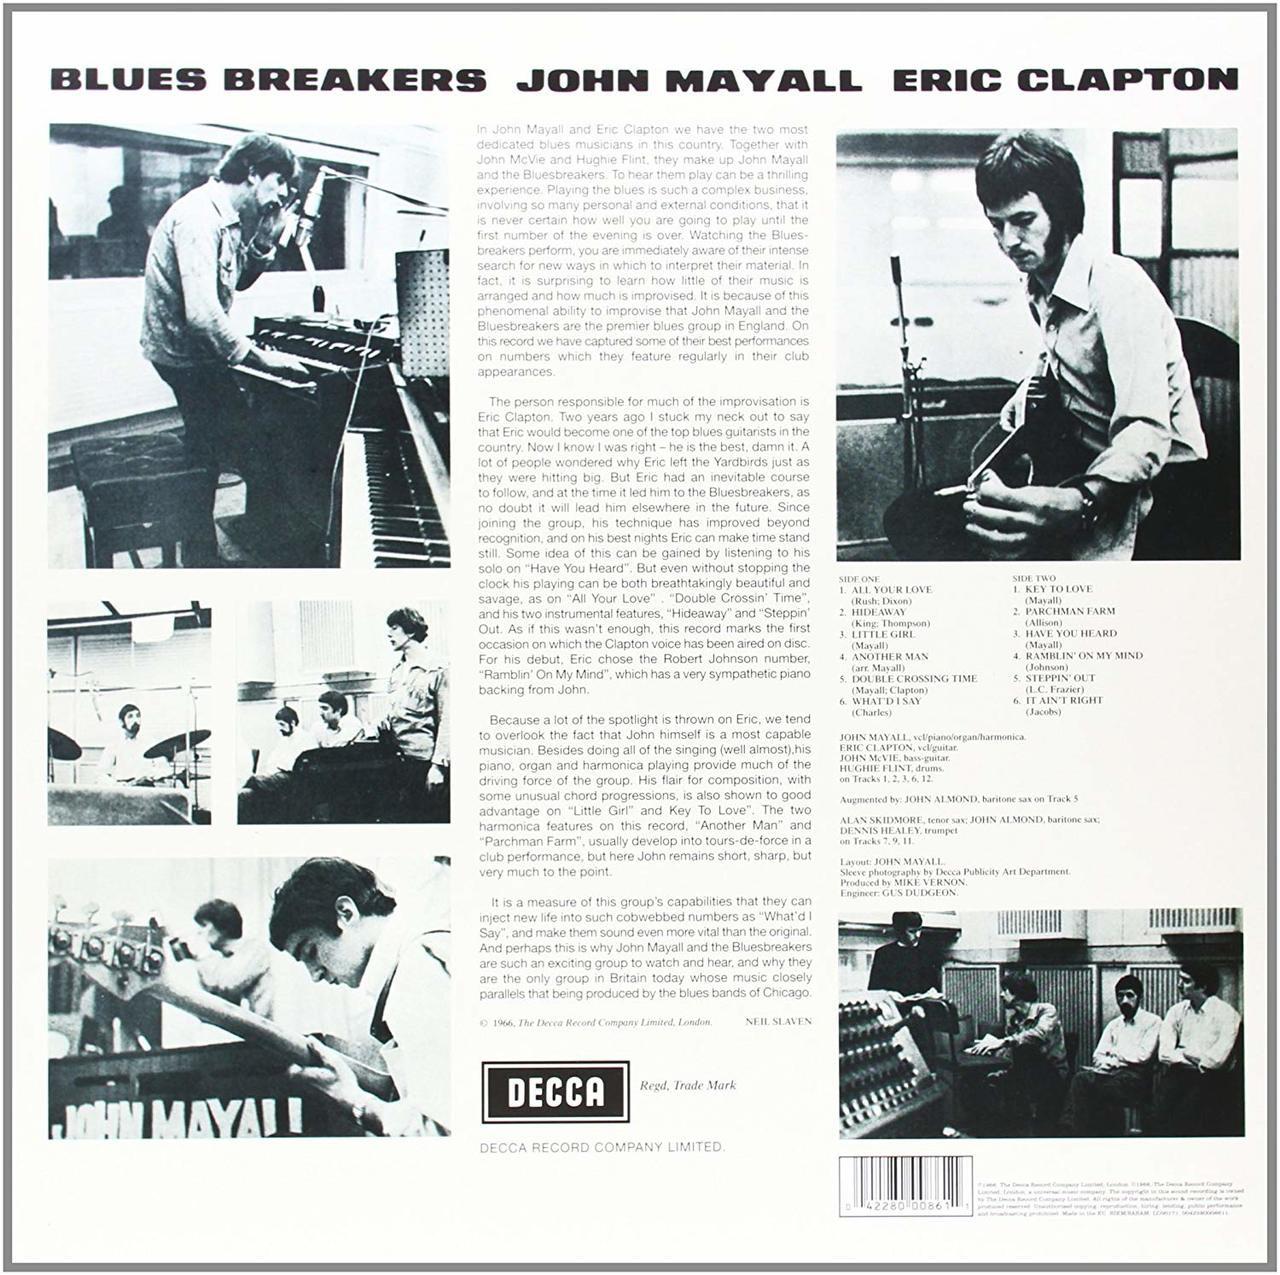 JOHN MAYALL & THE BLUESBREAKERS-Blues breakers-Double VINYL LP-Brand New-Still Sealed